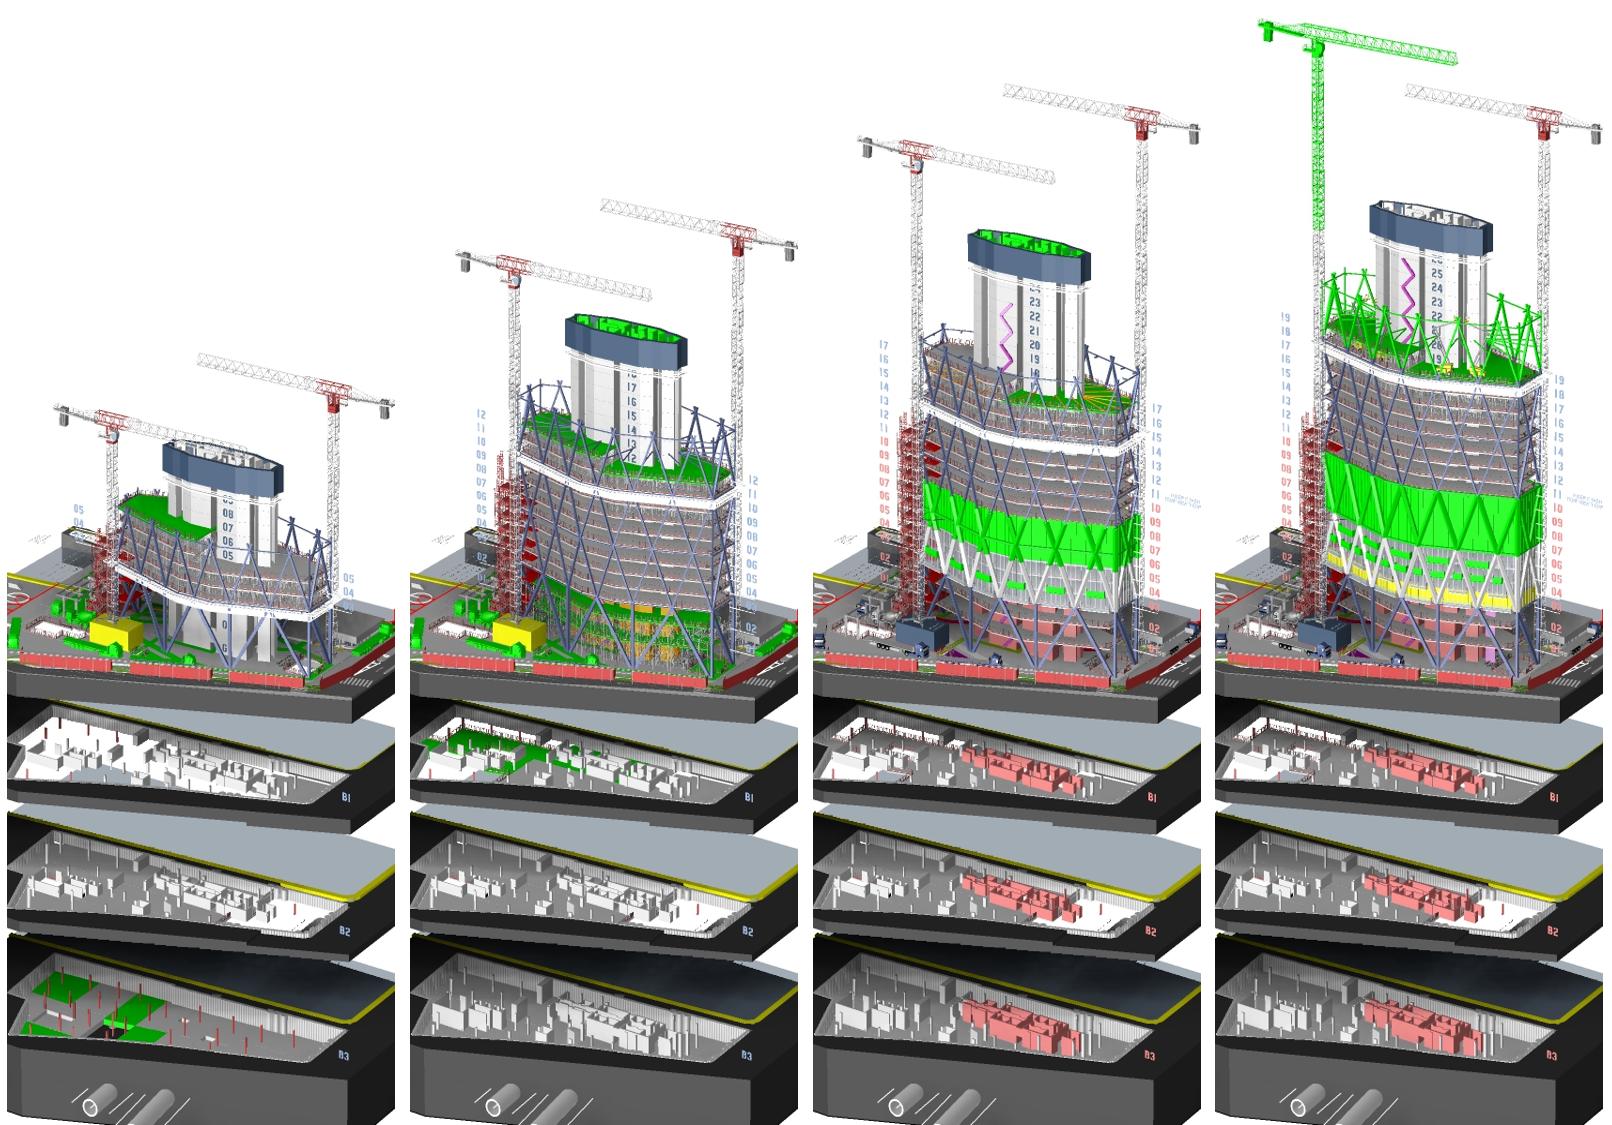 Newfoundland Development for Canary Wharf Contractors Ltd